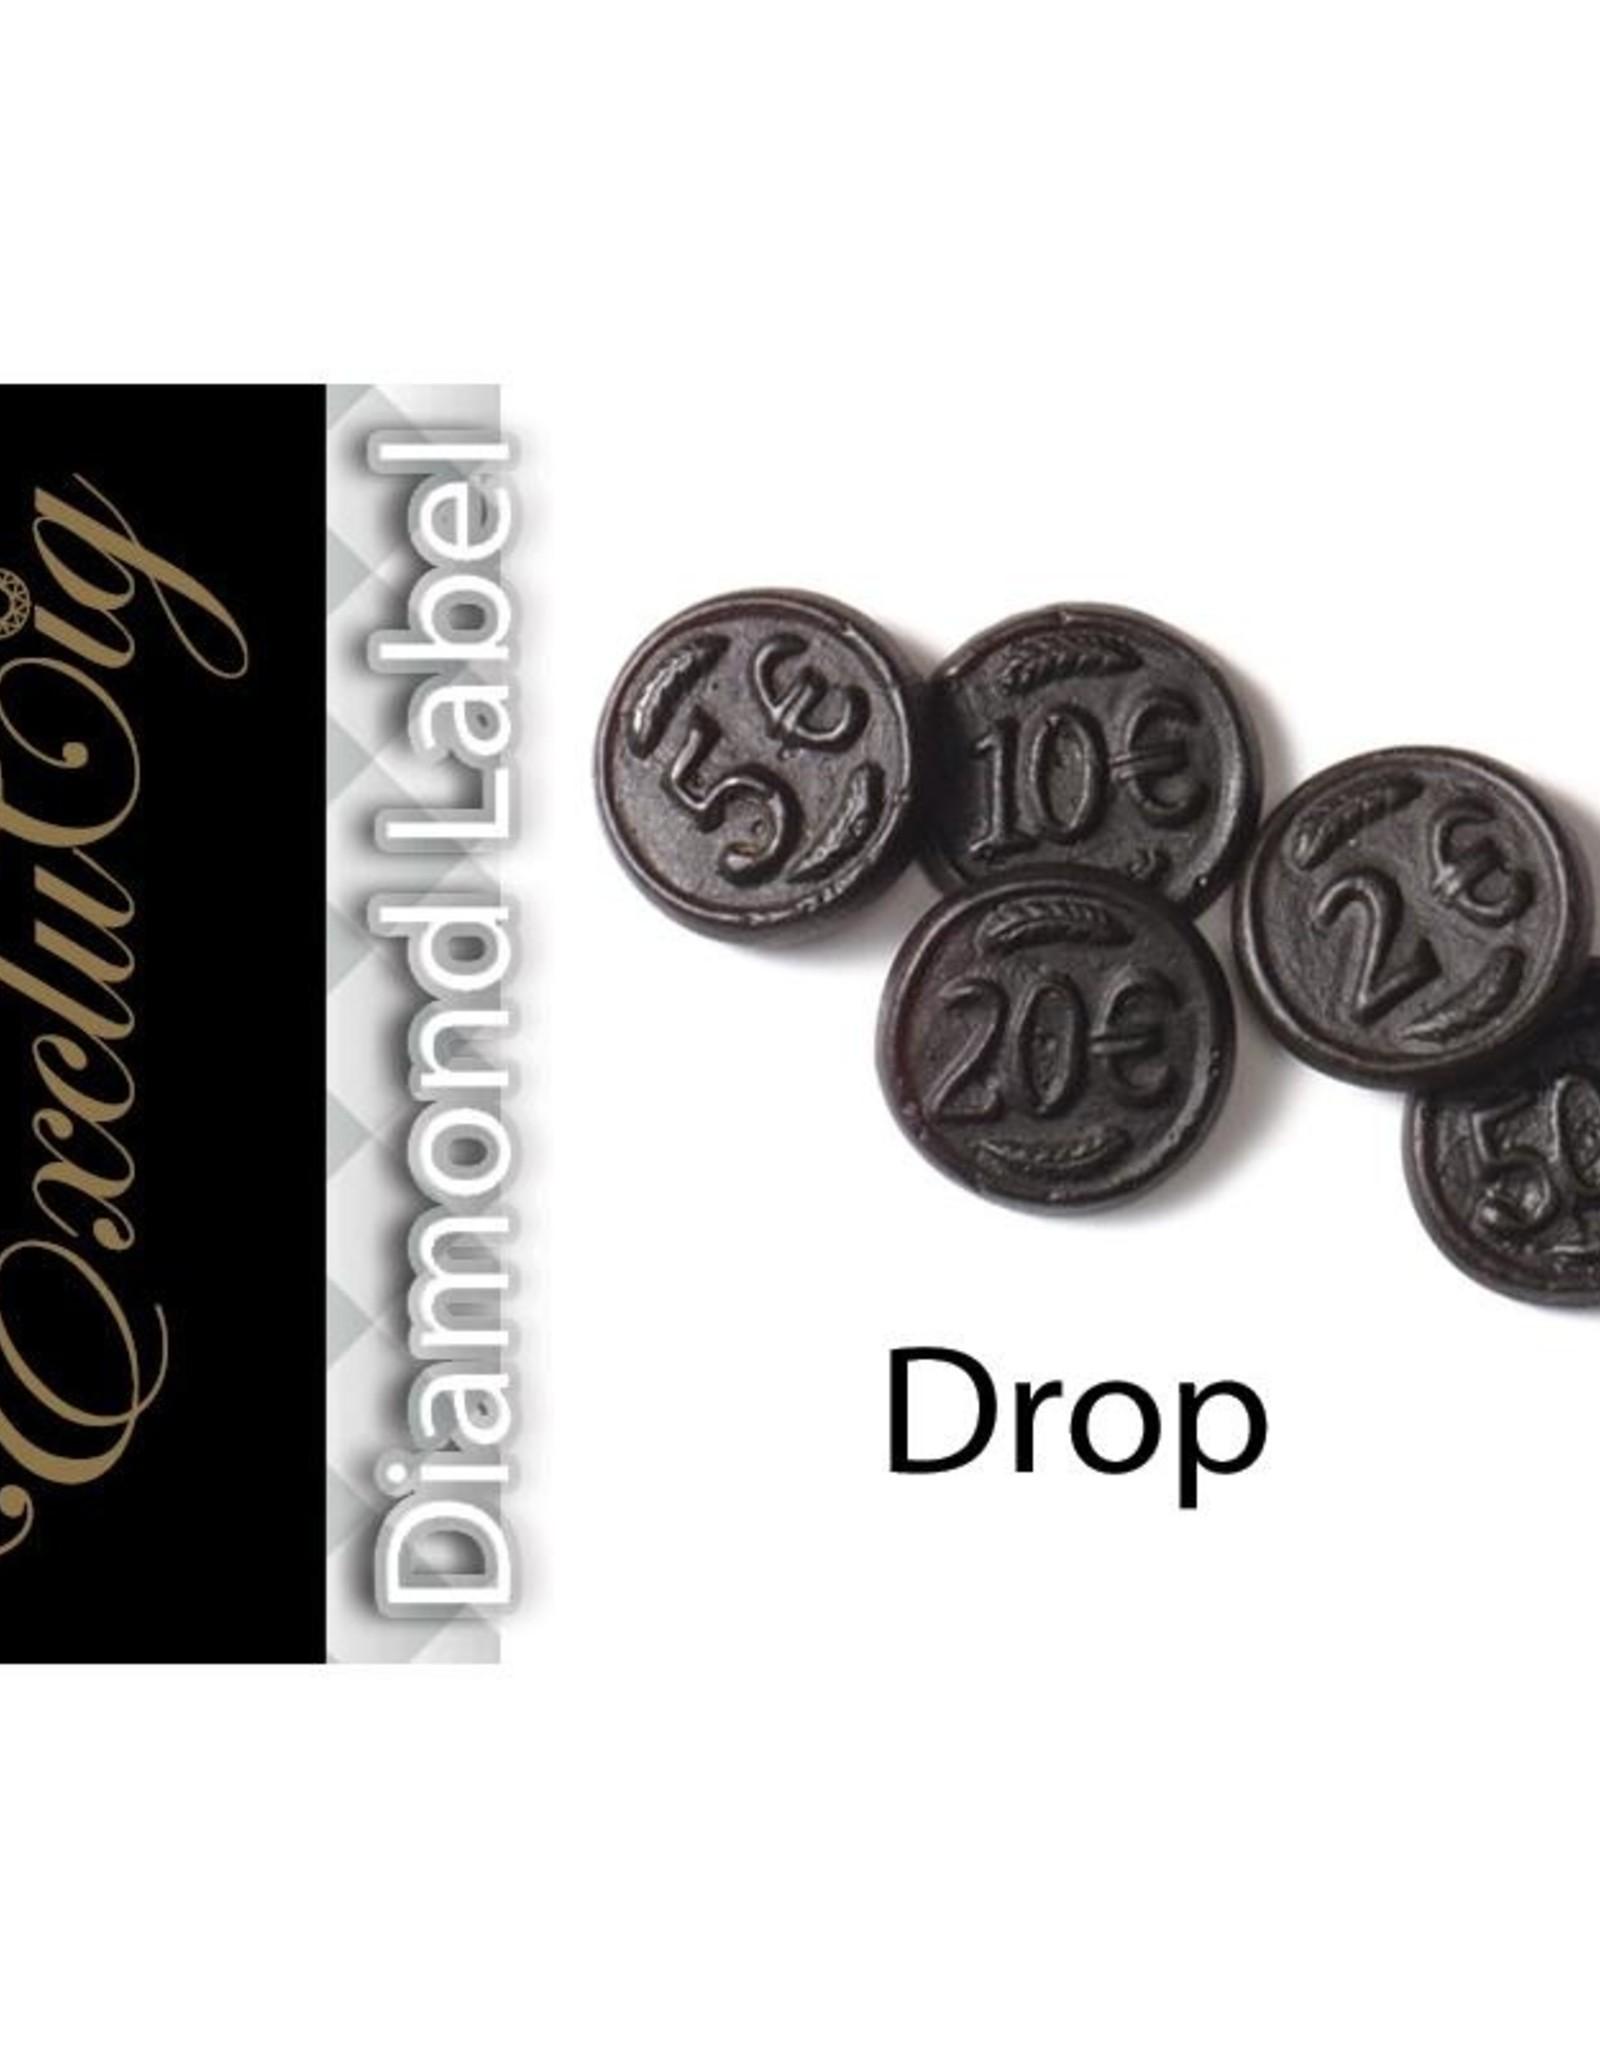 Exclucig Exclucig Diamond Label E-liquid Drop 6 mg Nicotine